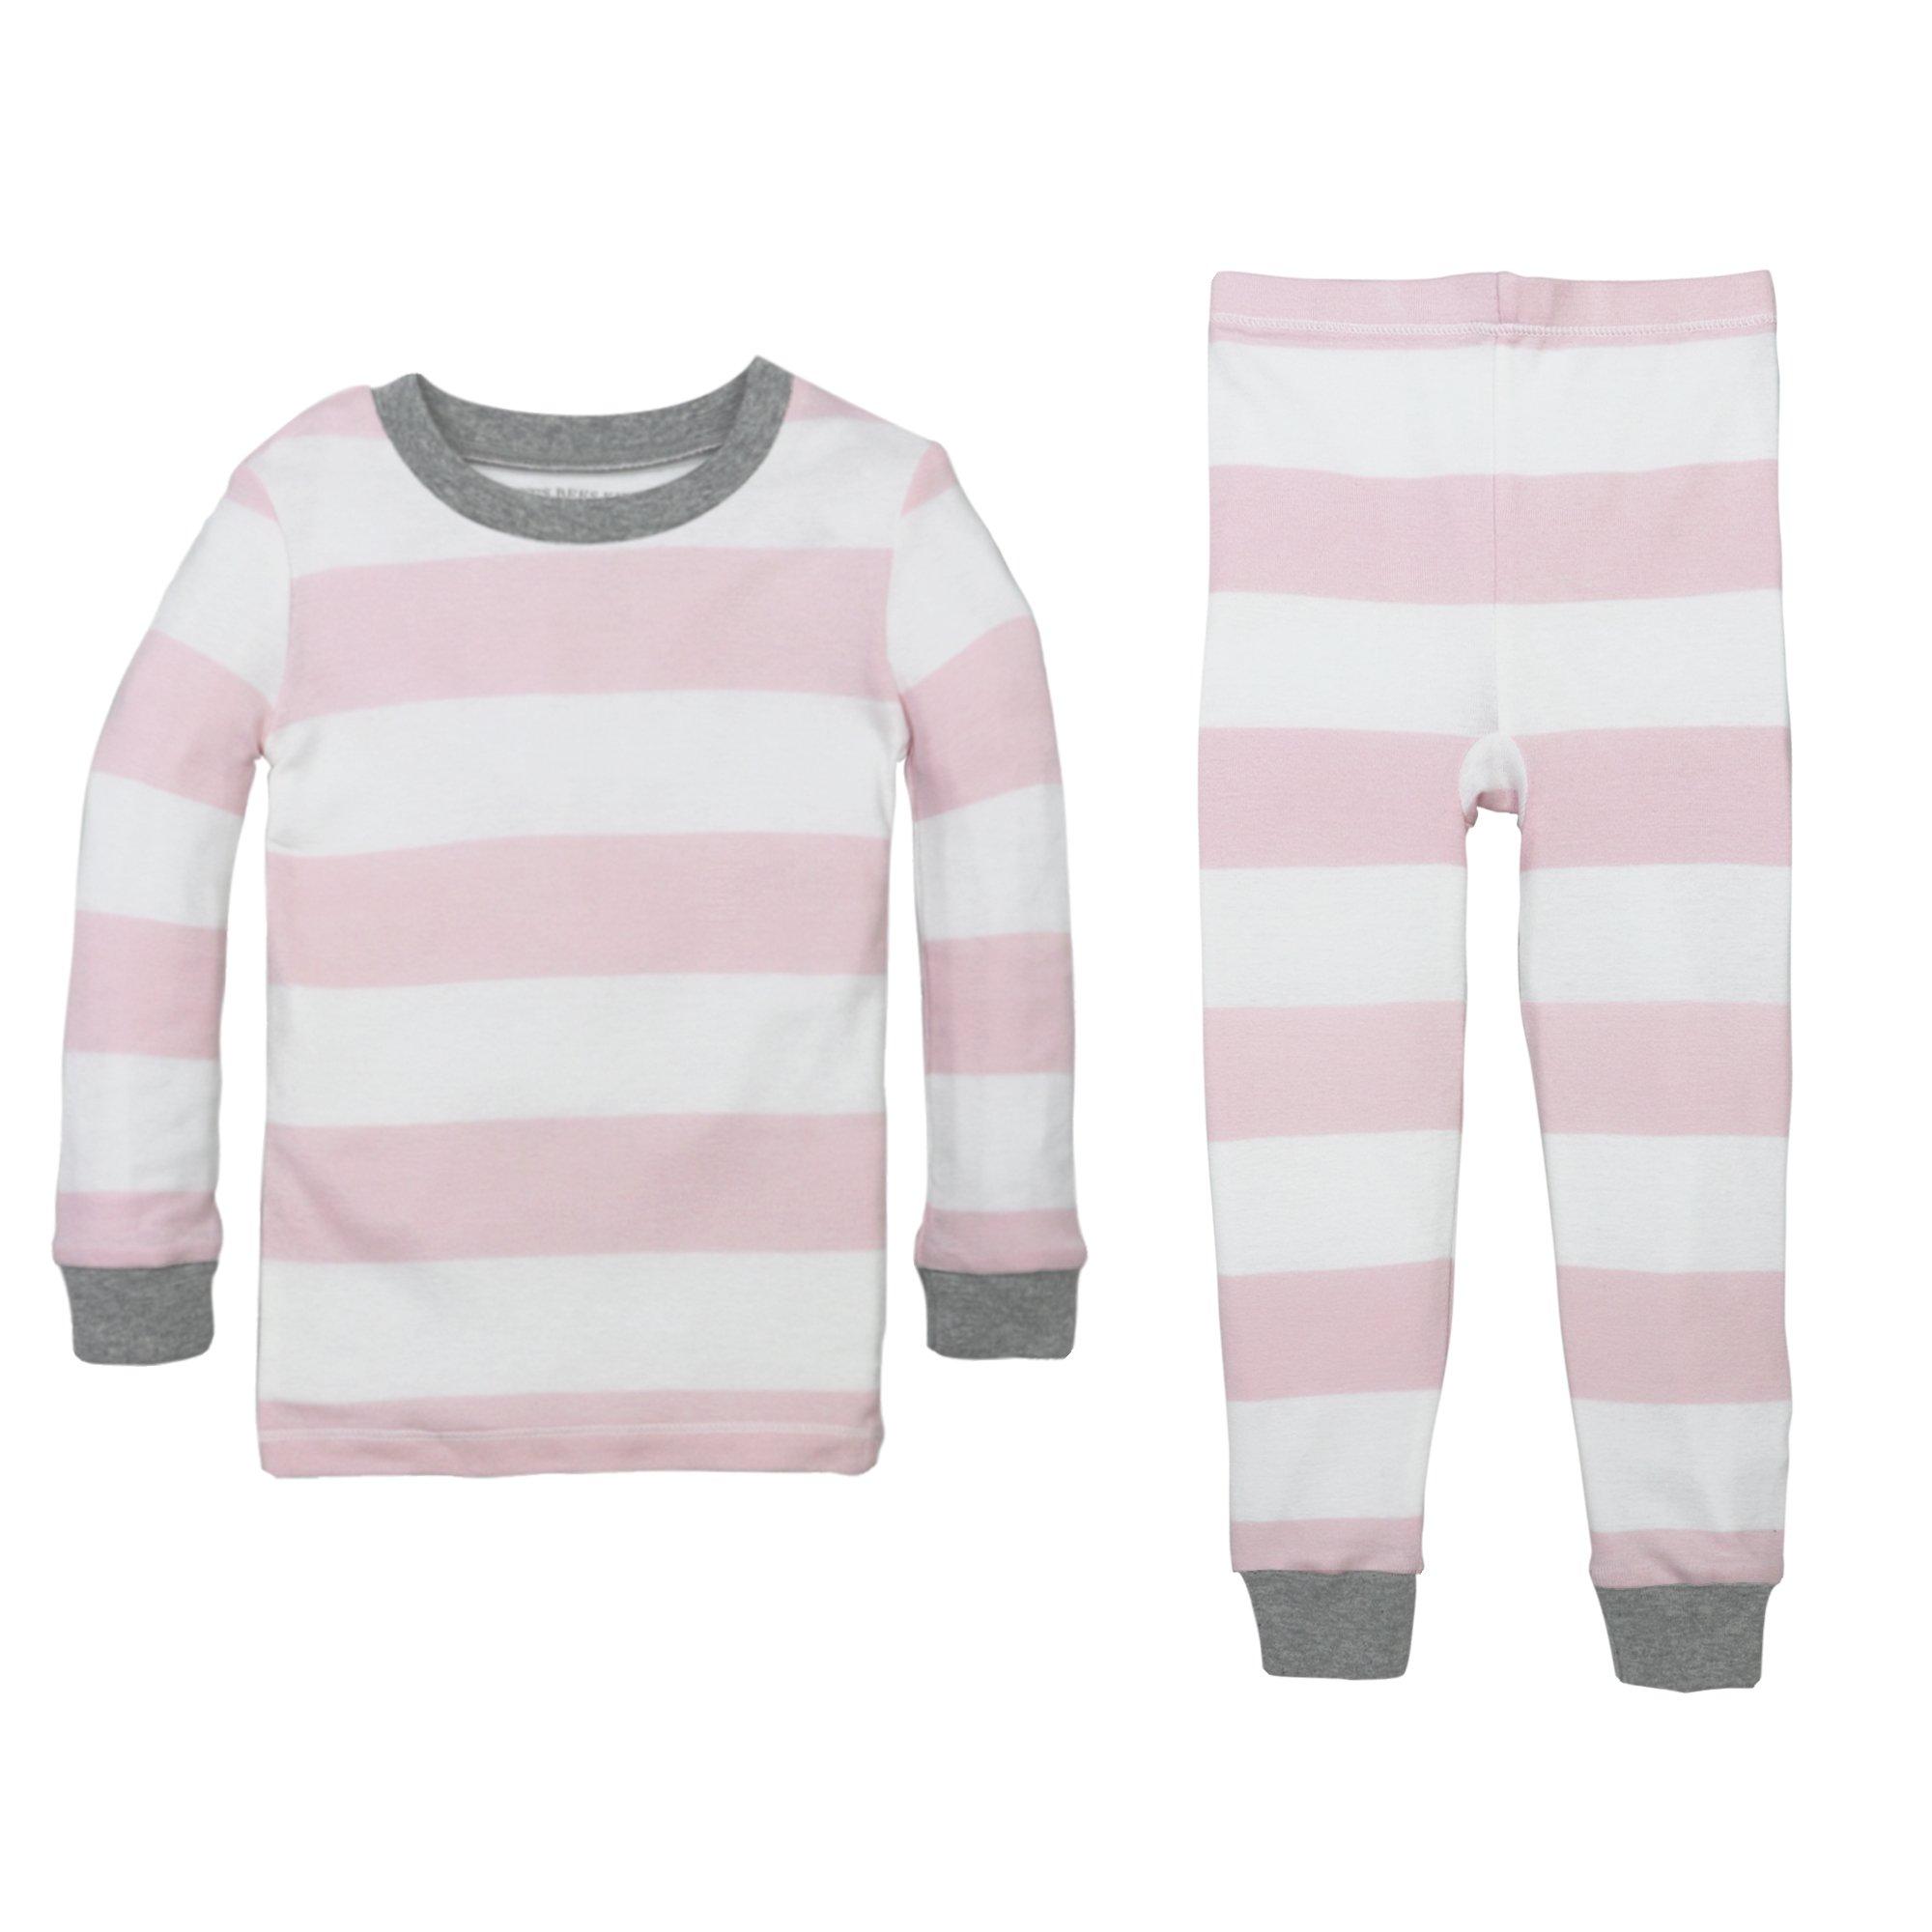 Burt's Bees Baby Unisex Baby Little Kid Pajamas, 2-Piece PJ Set, 100% Organic Cotton (12 Mo-7 Yrs), Blossom Rugby Stripe, 3T